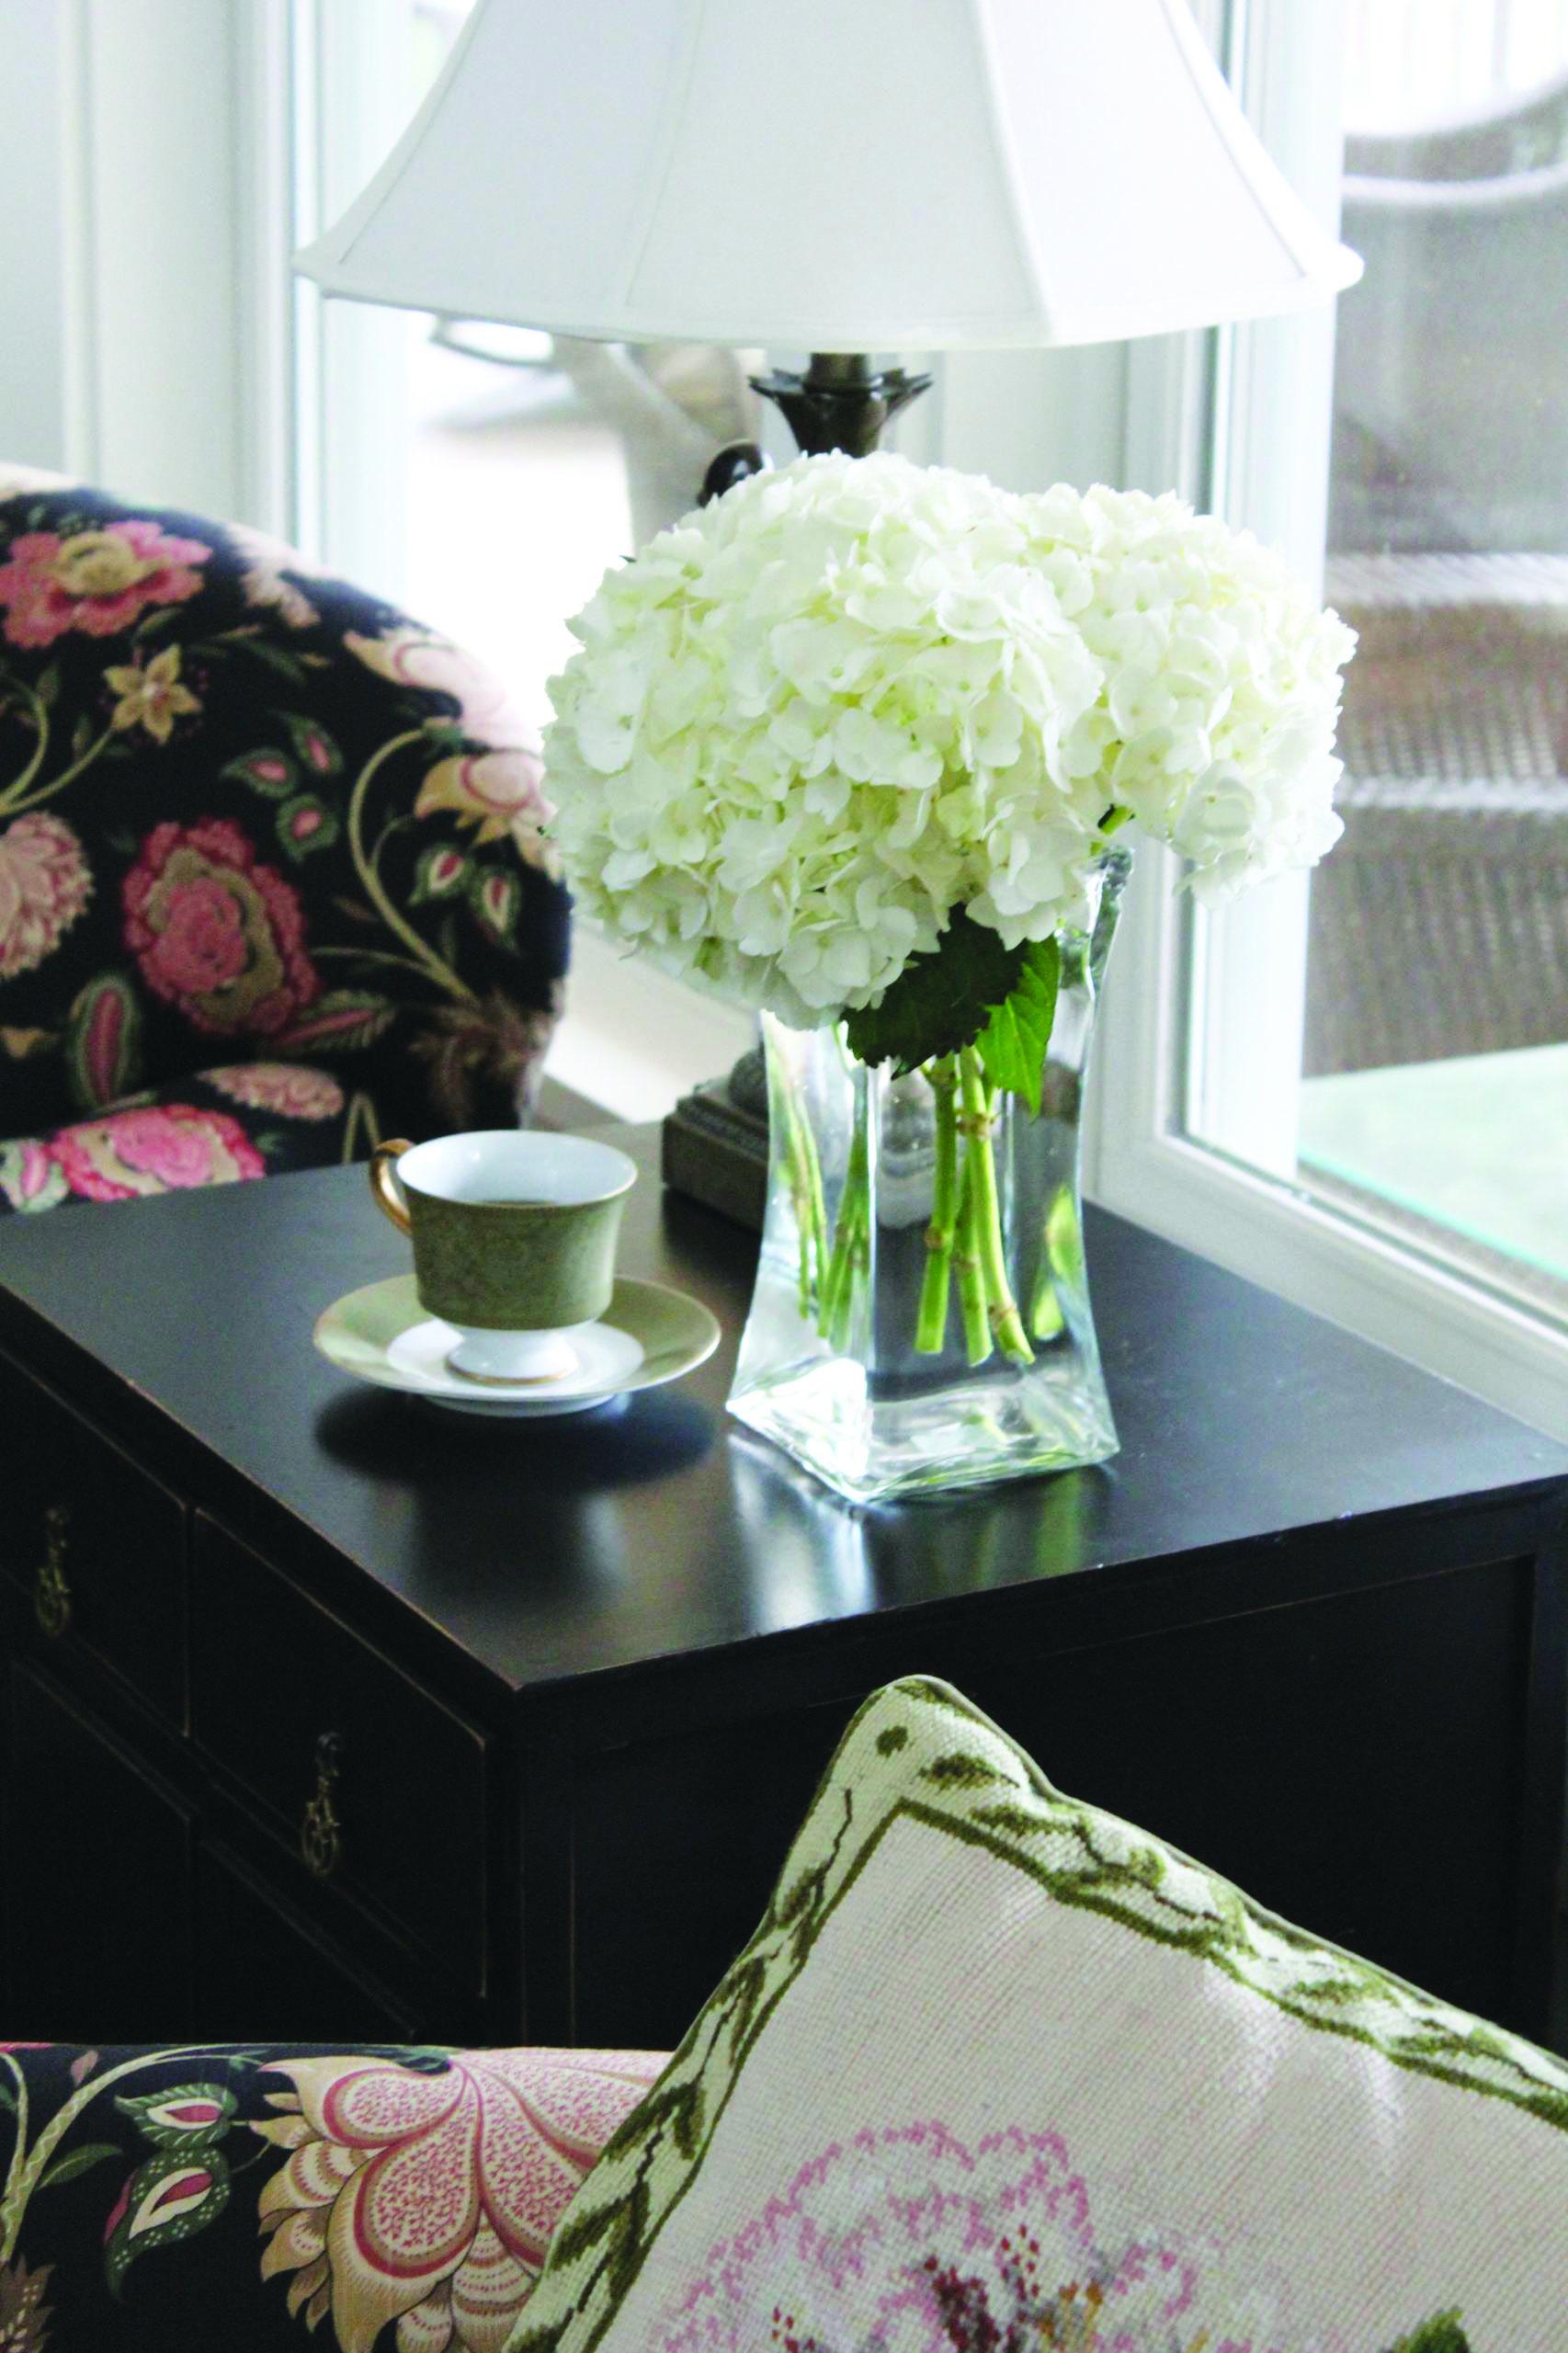 25 Hydrangea Flower Pot and Planter Arrangements (PHOTOS ... |Country Hydrangeas Vase